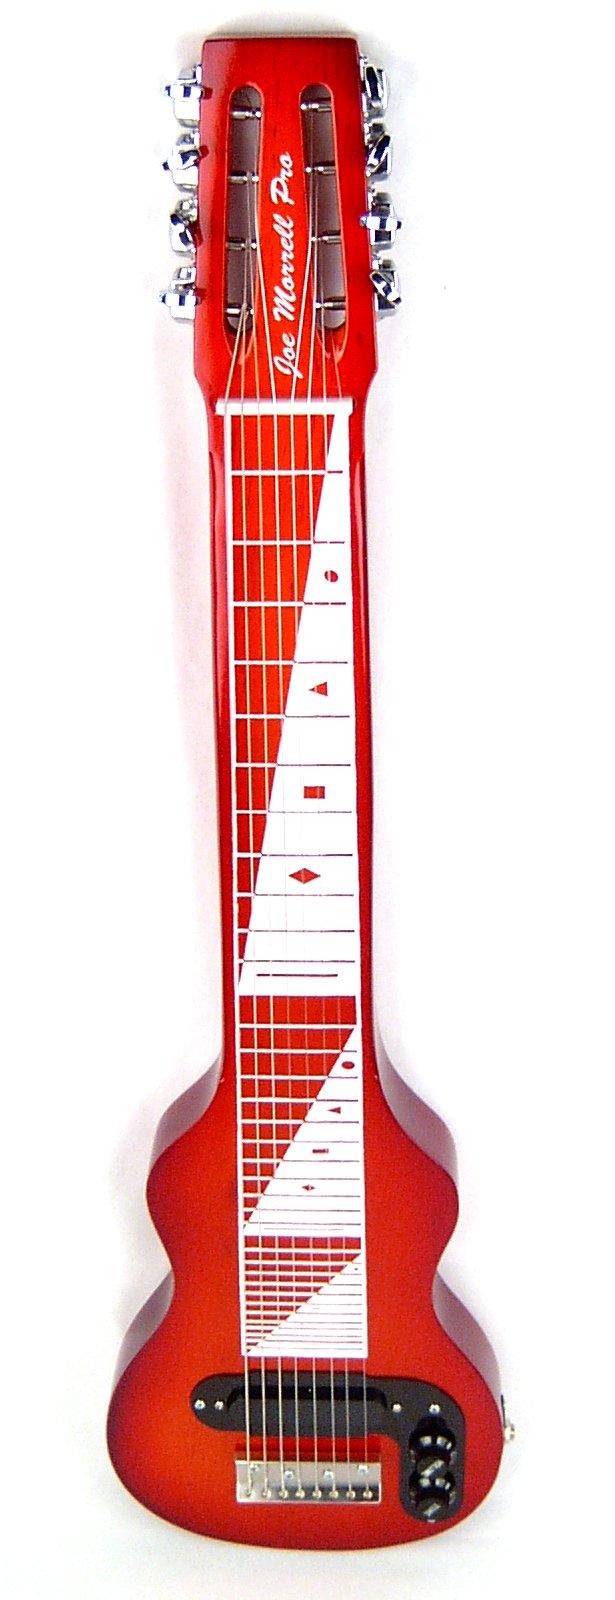 Joe Morrell Pro Series Maple Body 8-String Lap Steel Guitar - Cherry Sunburst Finish USA